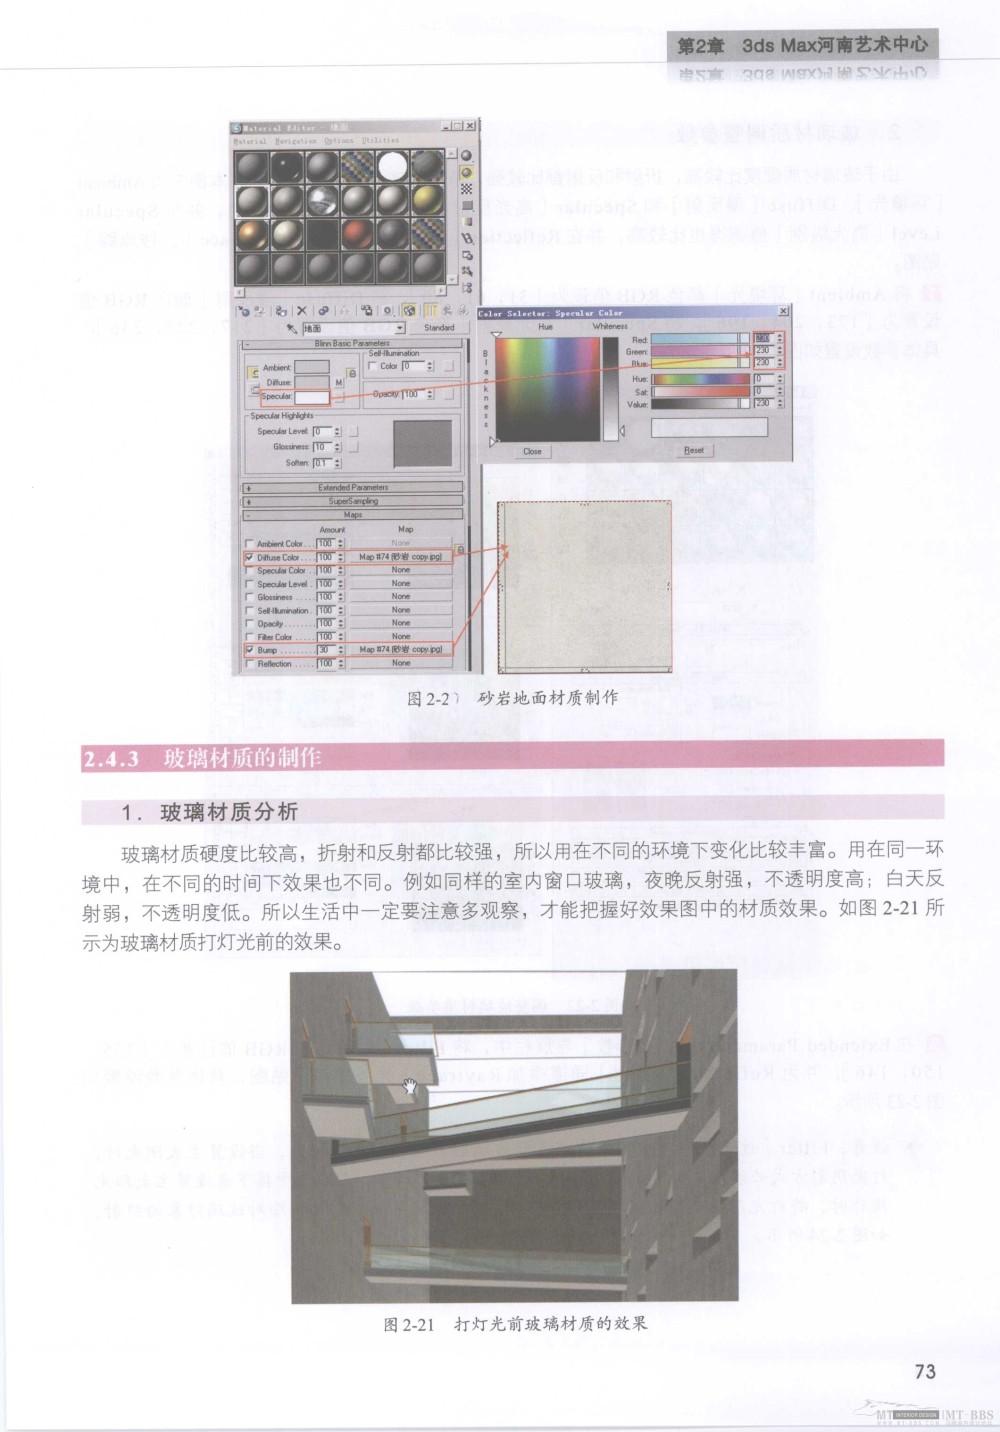 水晶石技法-3ds_Max&VRay室内空间表现_水晶石技法-3ds_Max&VRay室内空间表现_页面_079.jpg